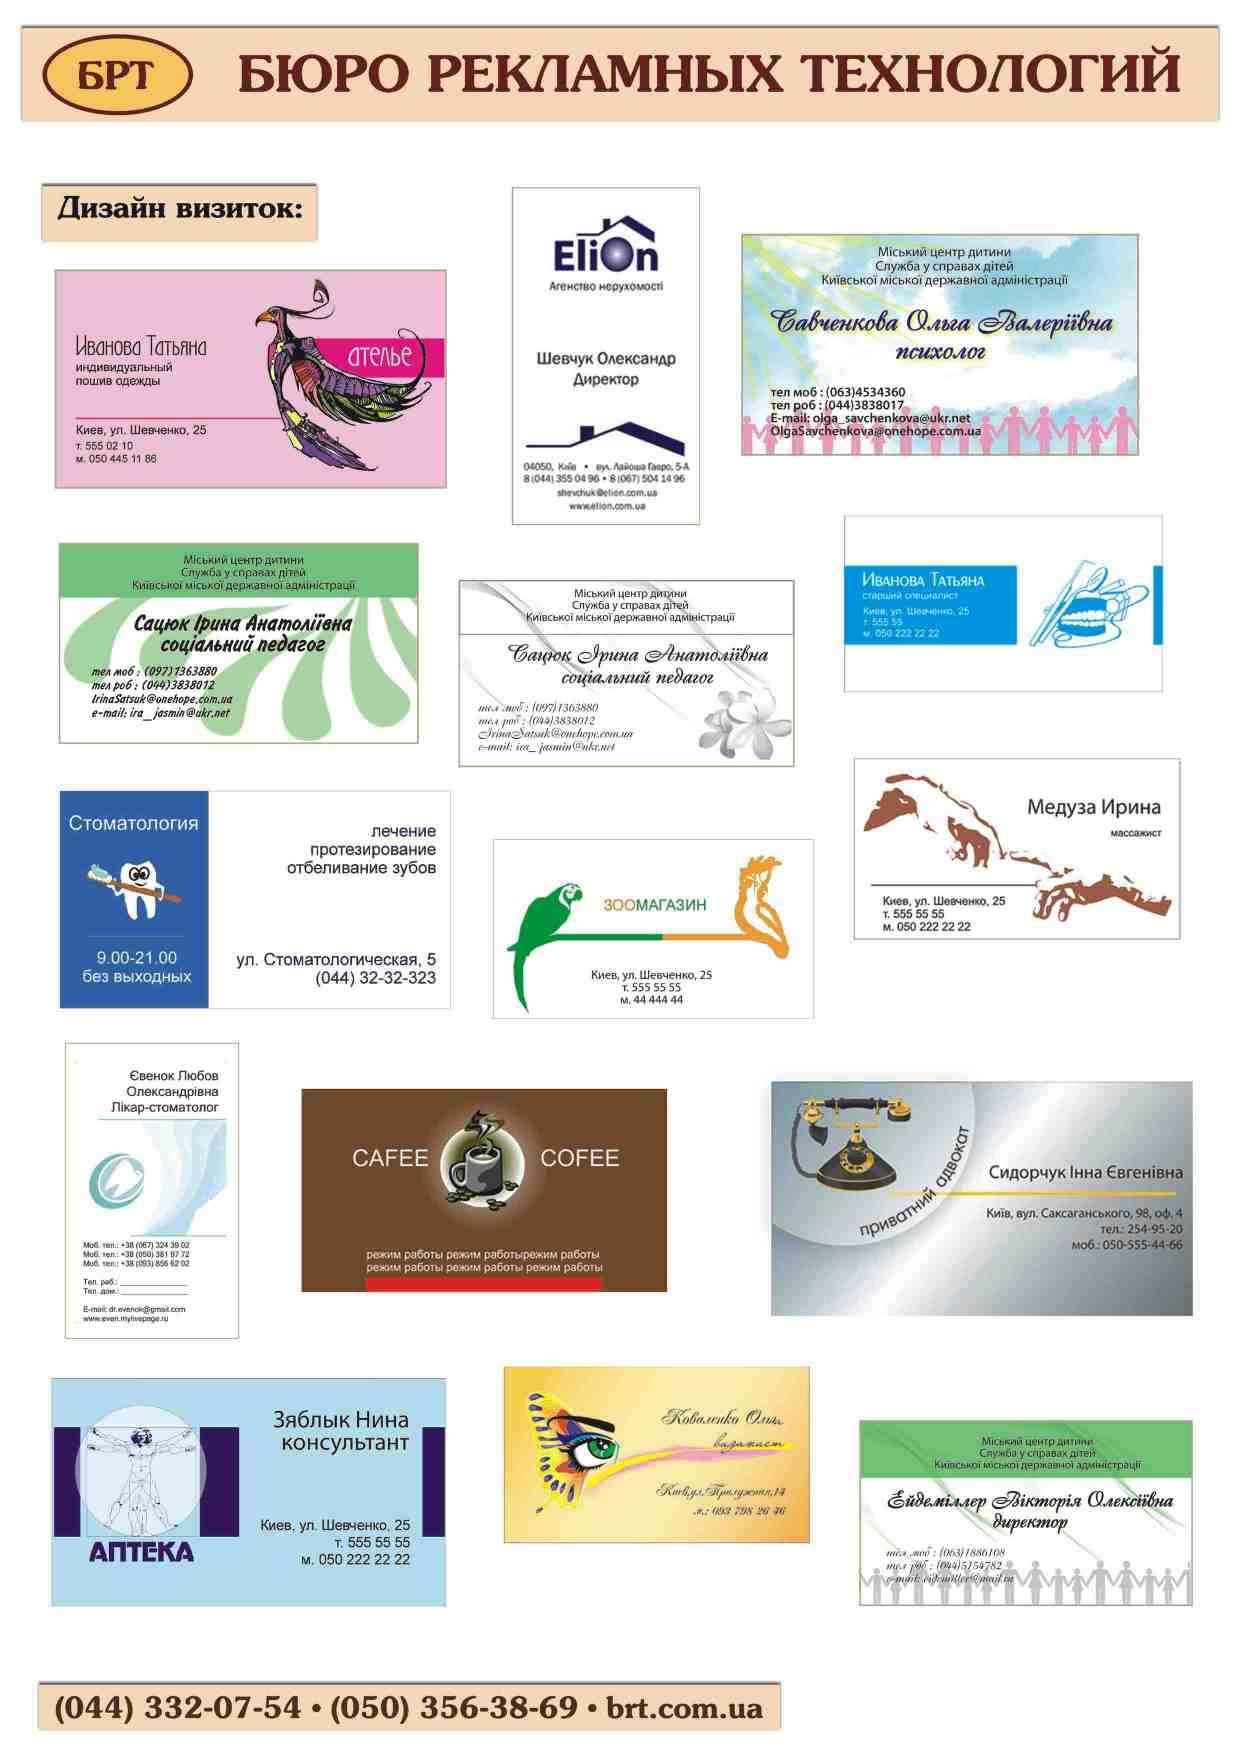 Дизайн бюро омск визитки